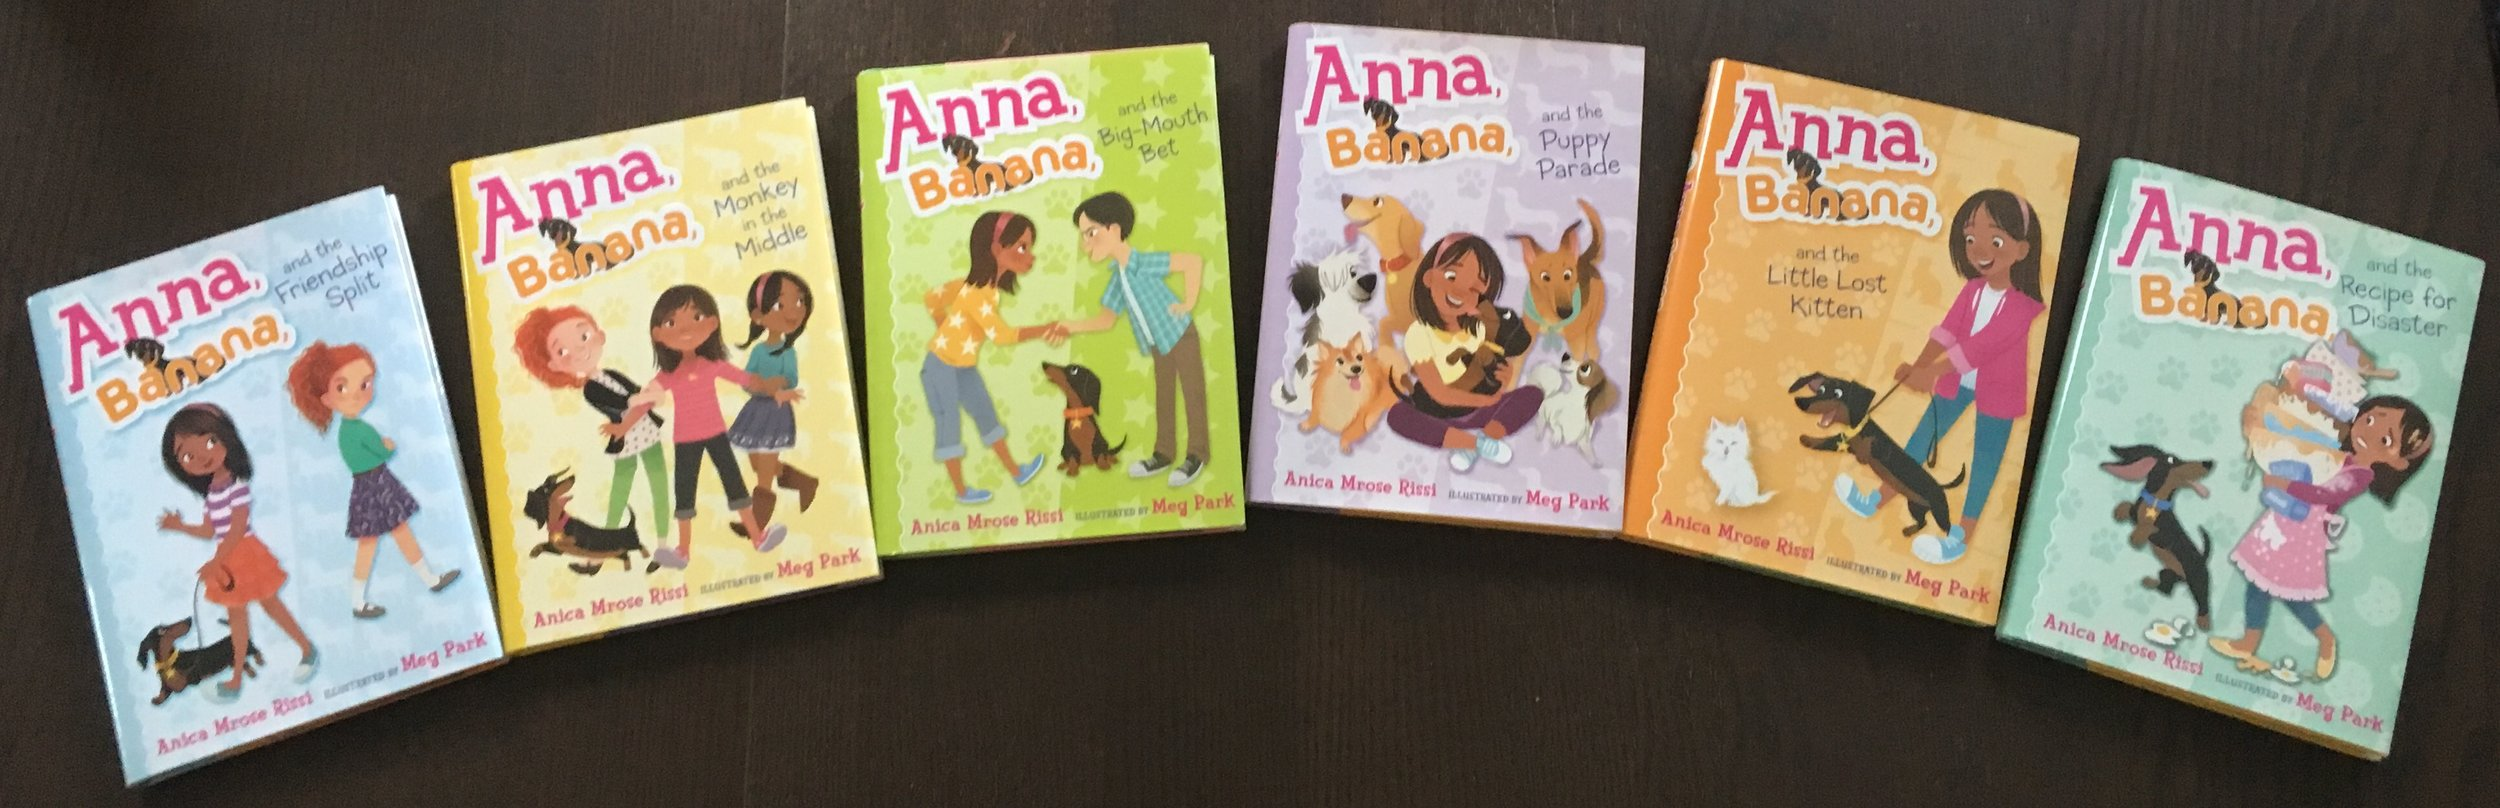 Anna Banana books by Anica Mrose Rissi.jpg